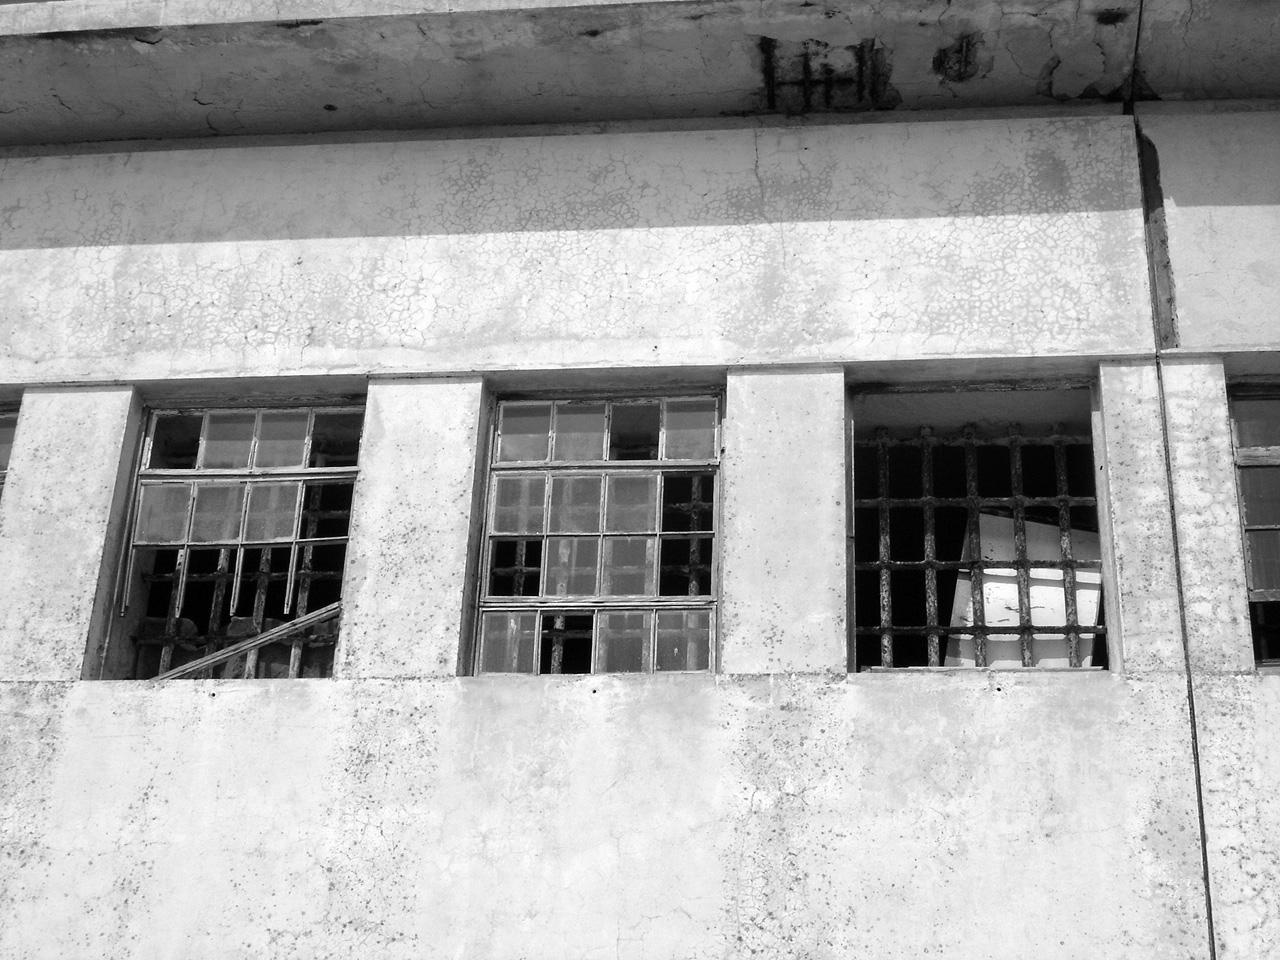 Carcel_prison_1_flickr.jpg